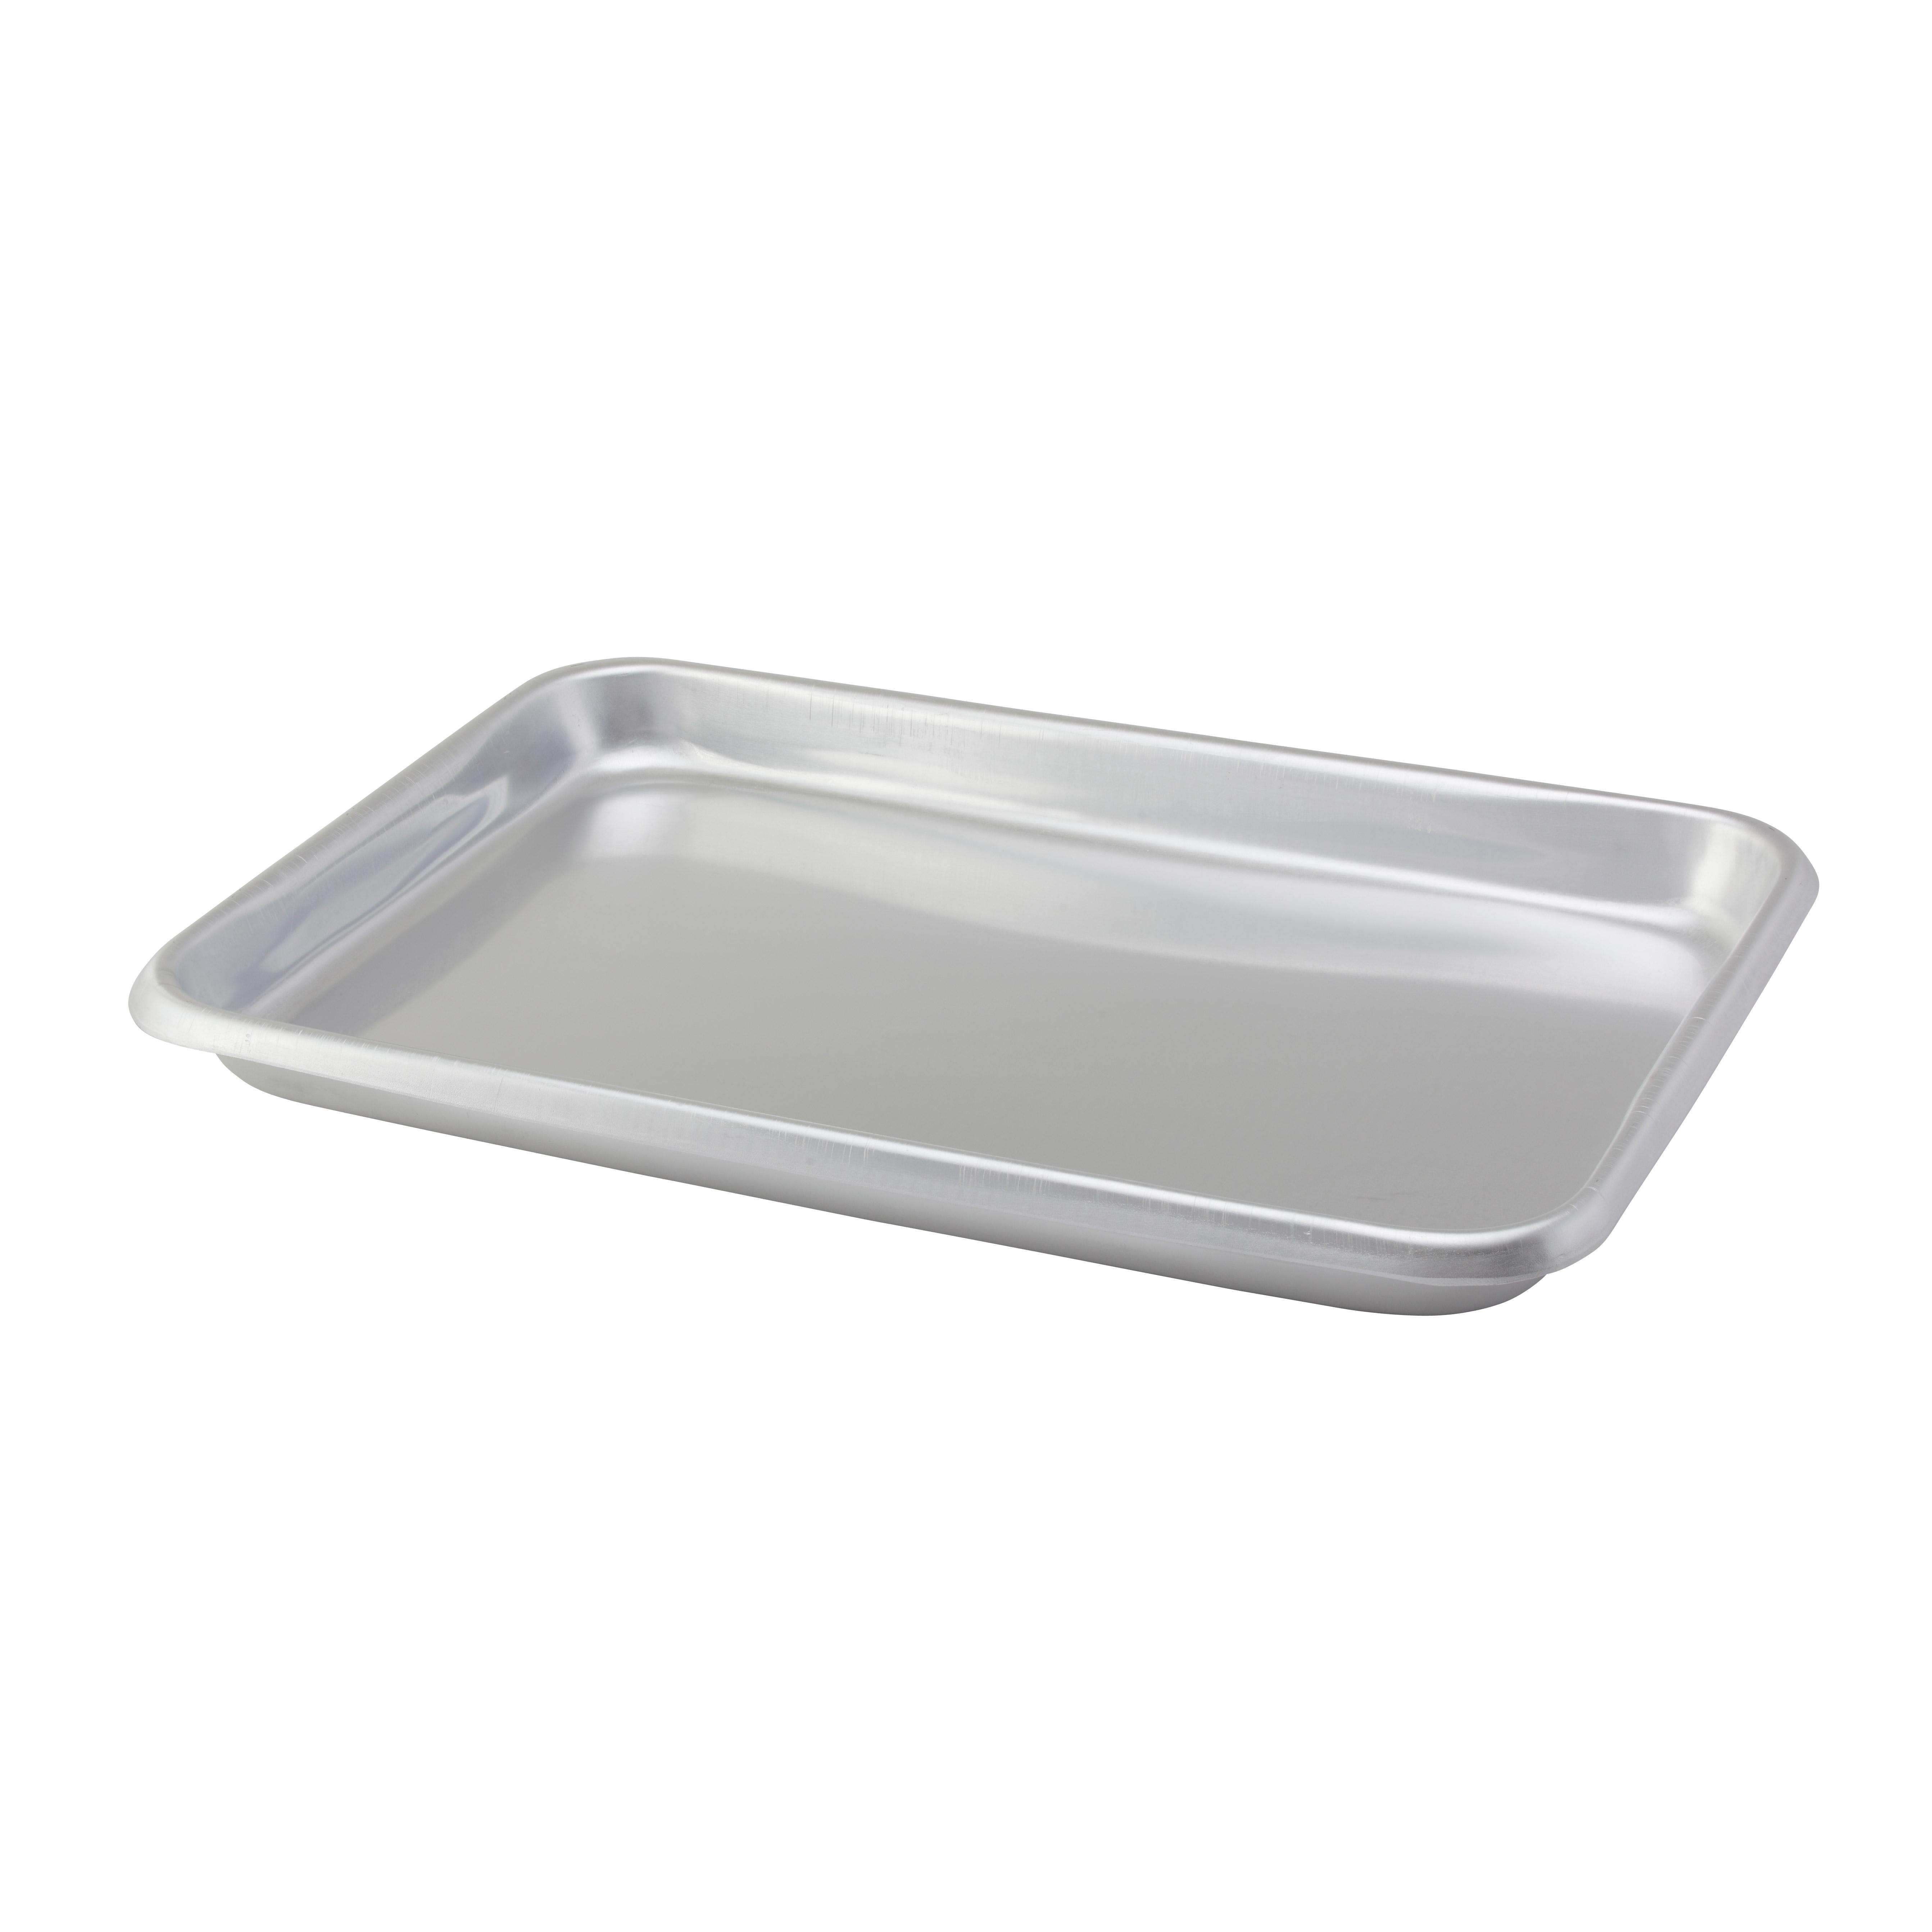 Royal Industries ROY BP 182625 bake pan